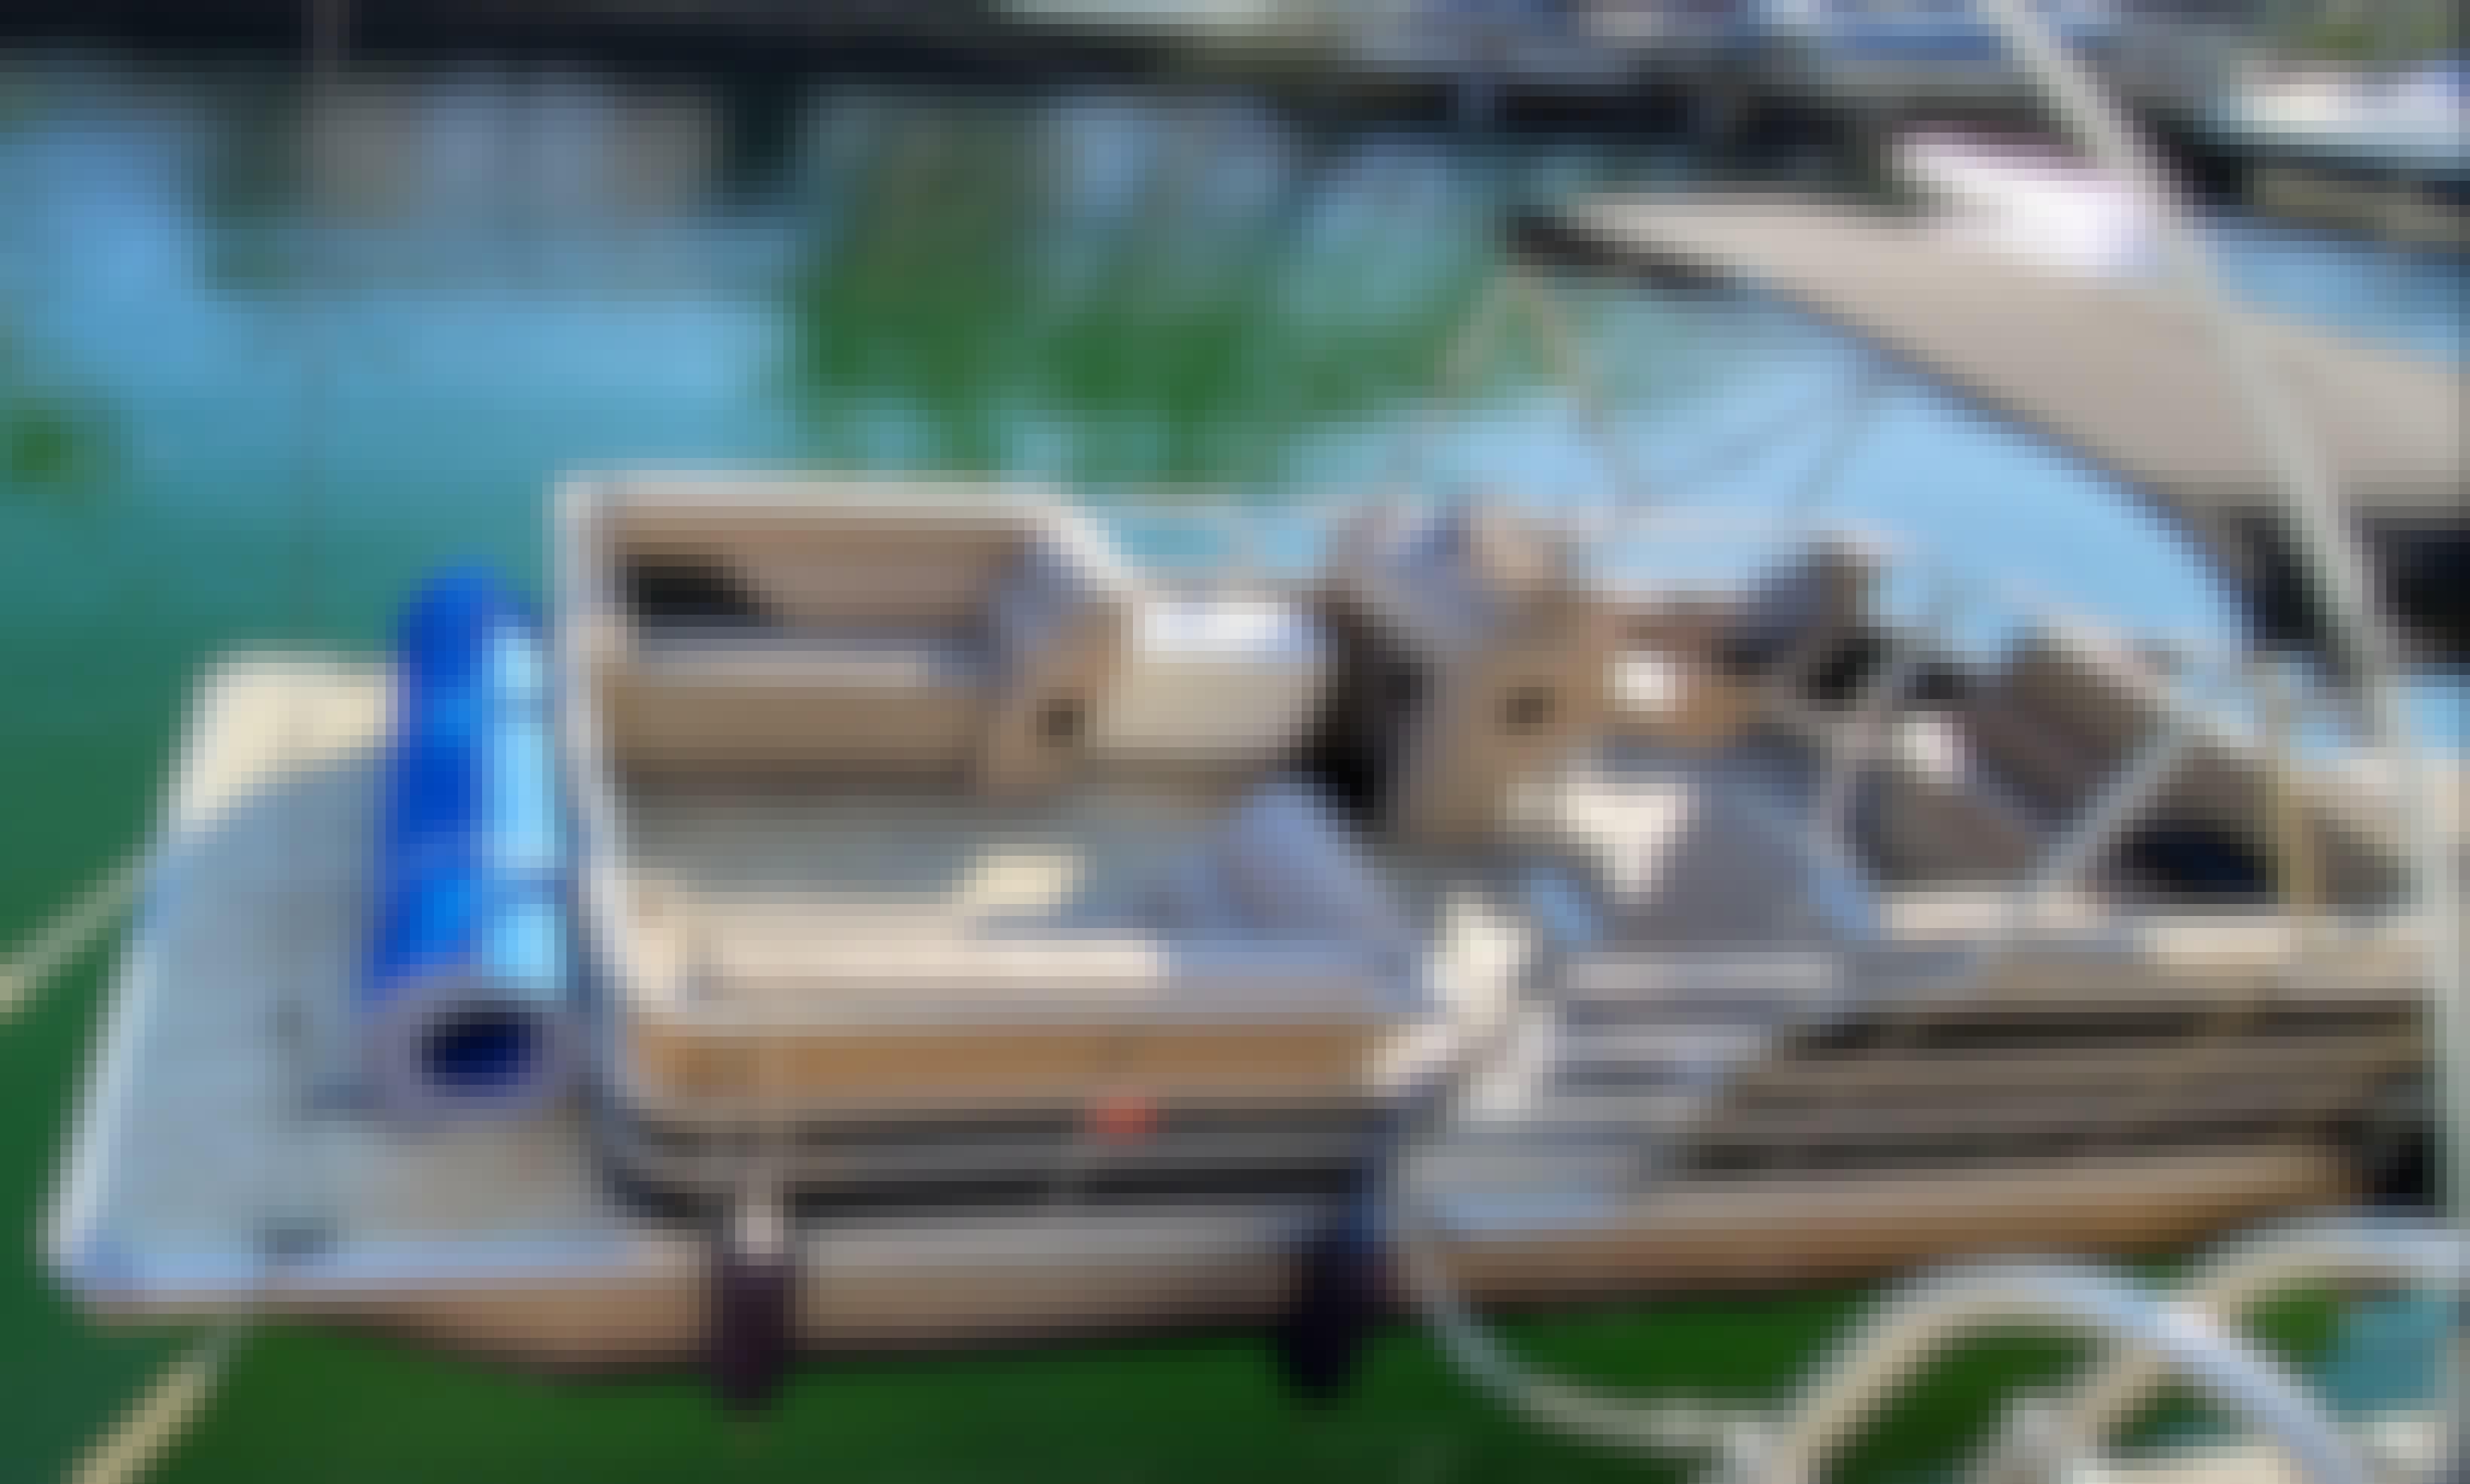 Sandbar Party Boat in Miami - Seats 12 People